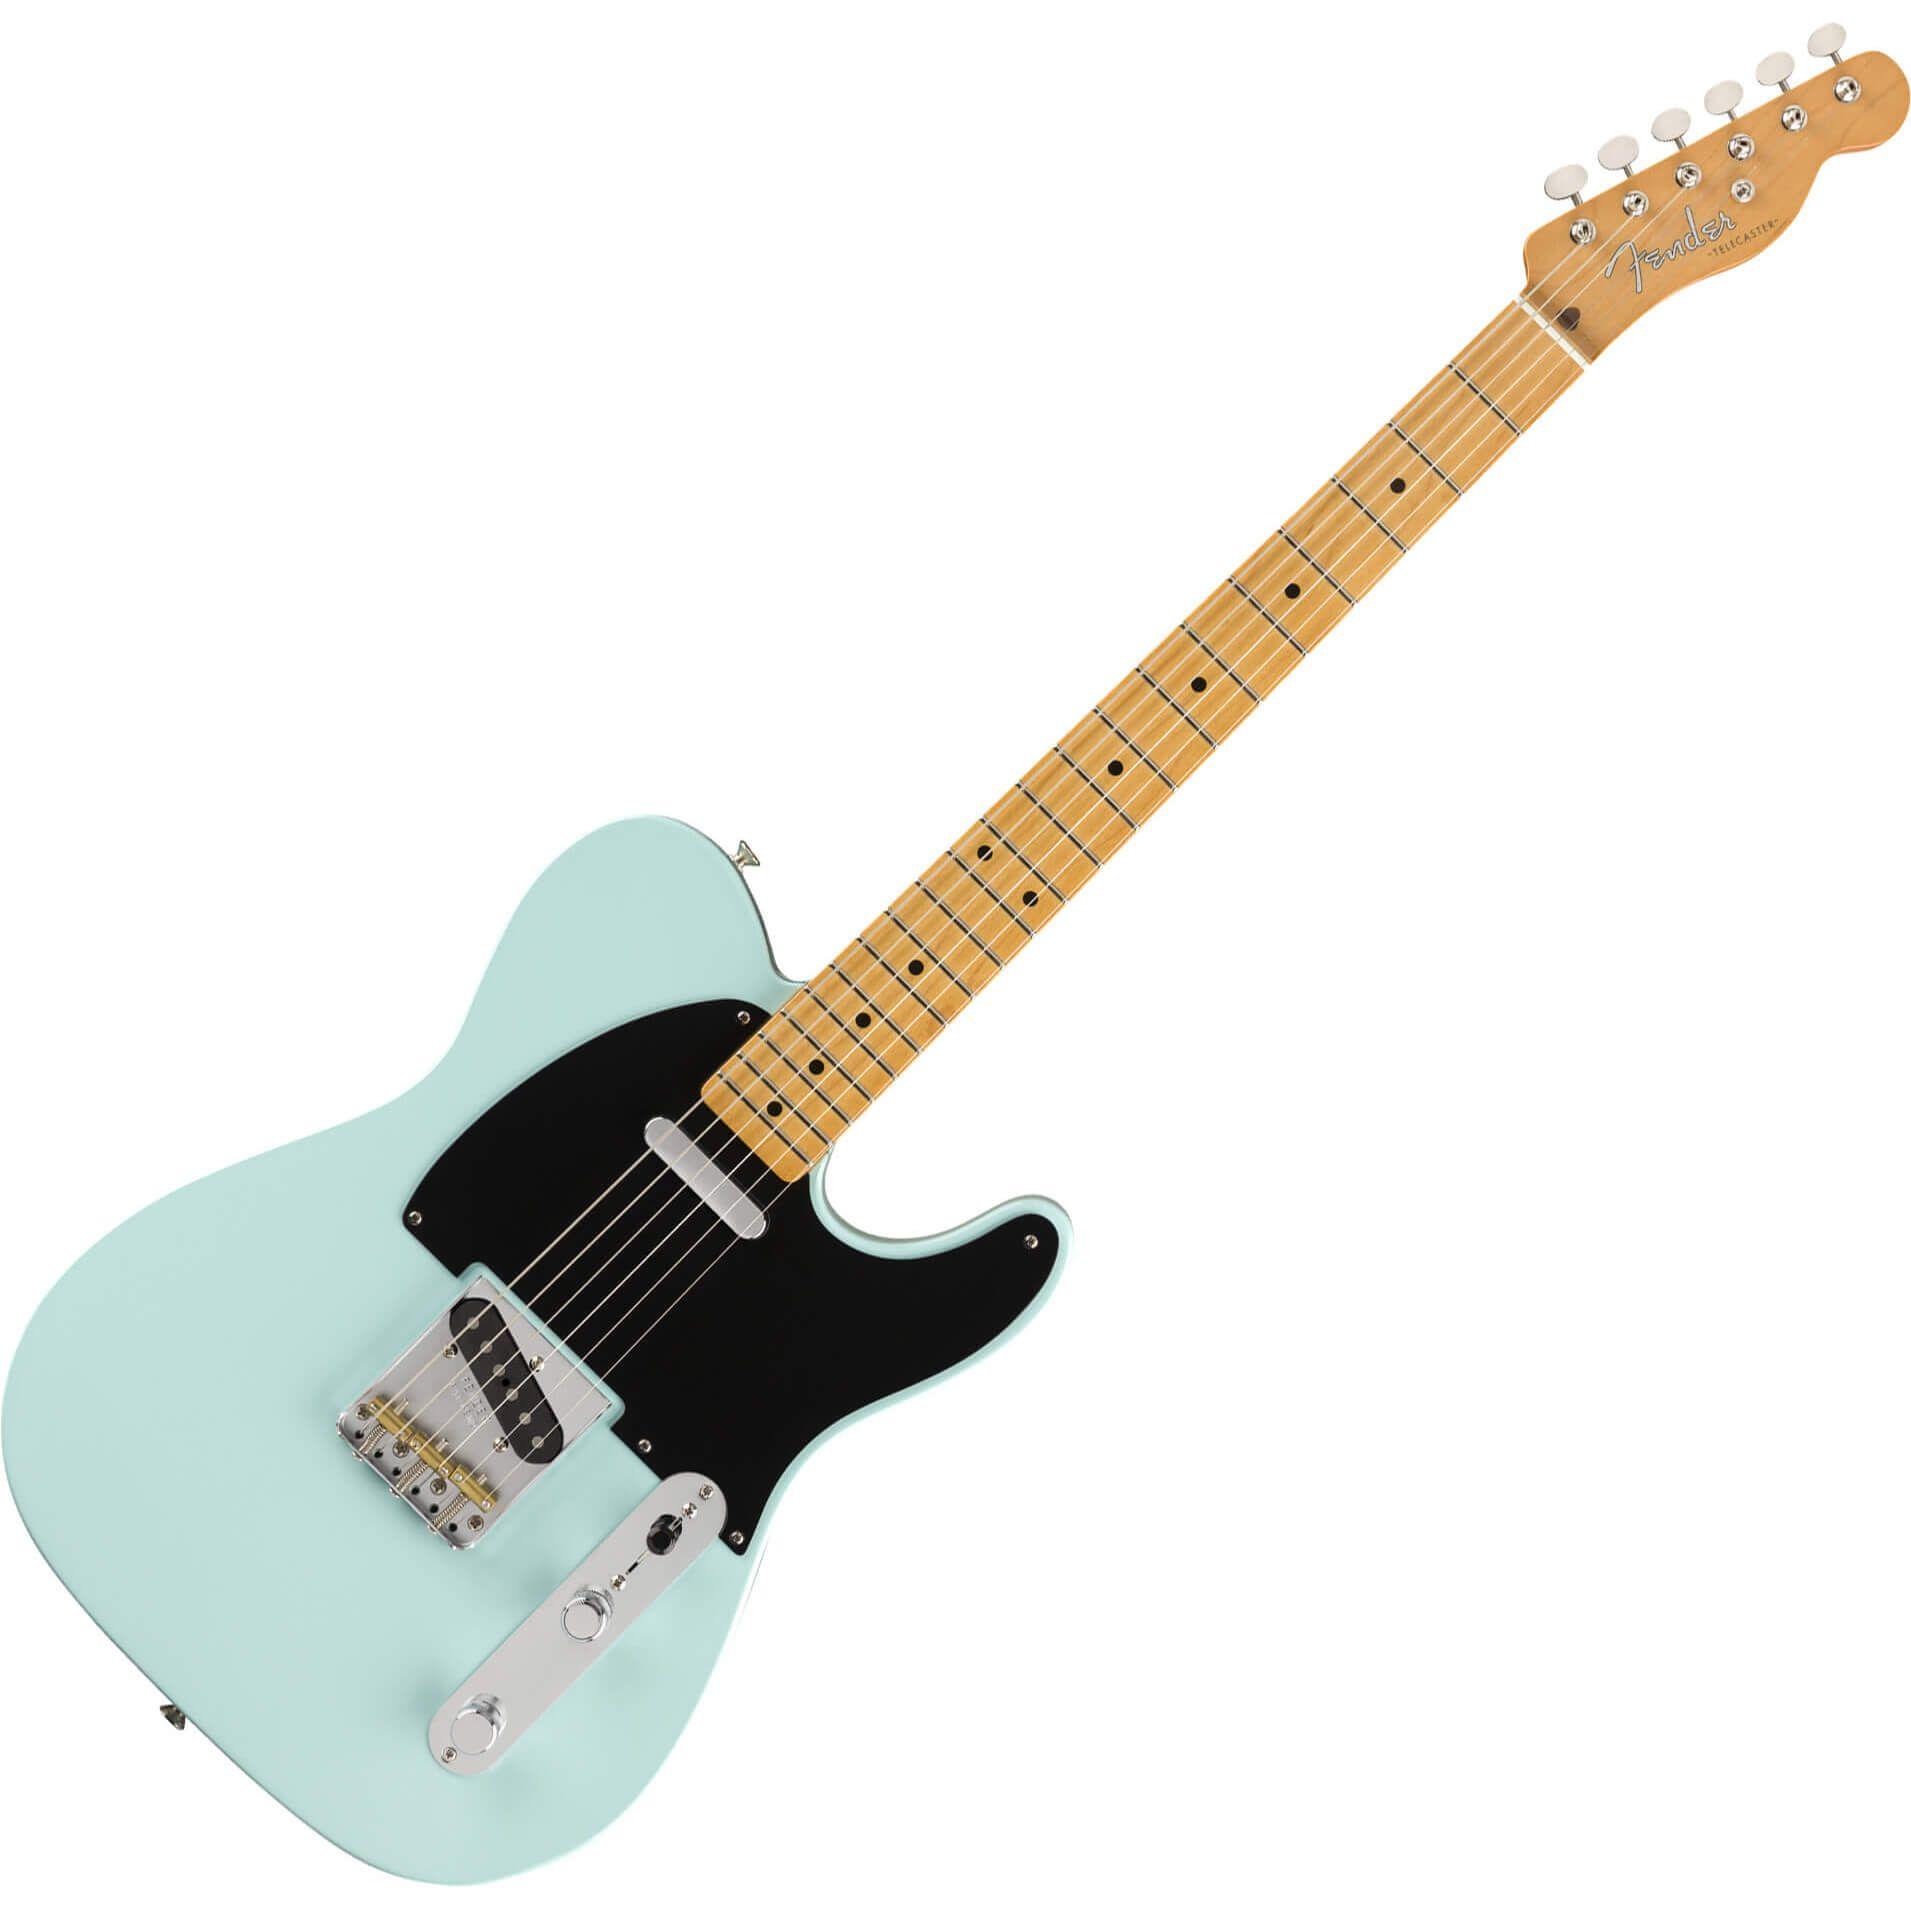 Fender Vintera Series 50s MOD Telecaster - MN - Daphne Blue